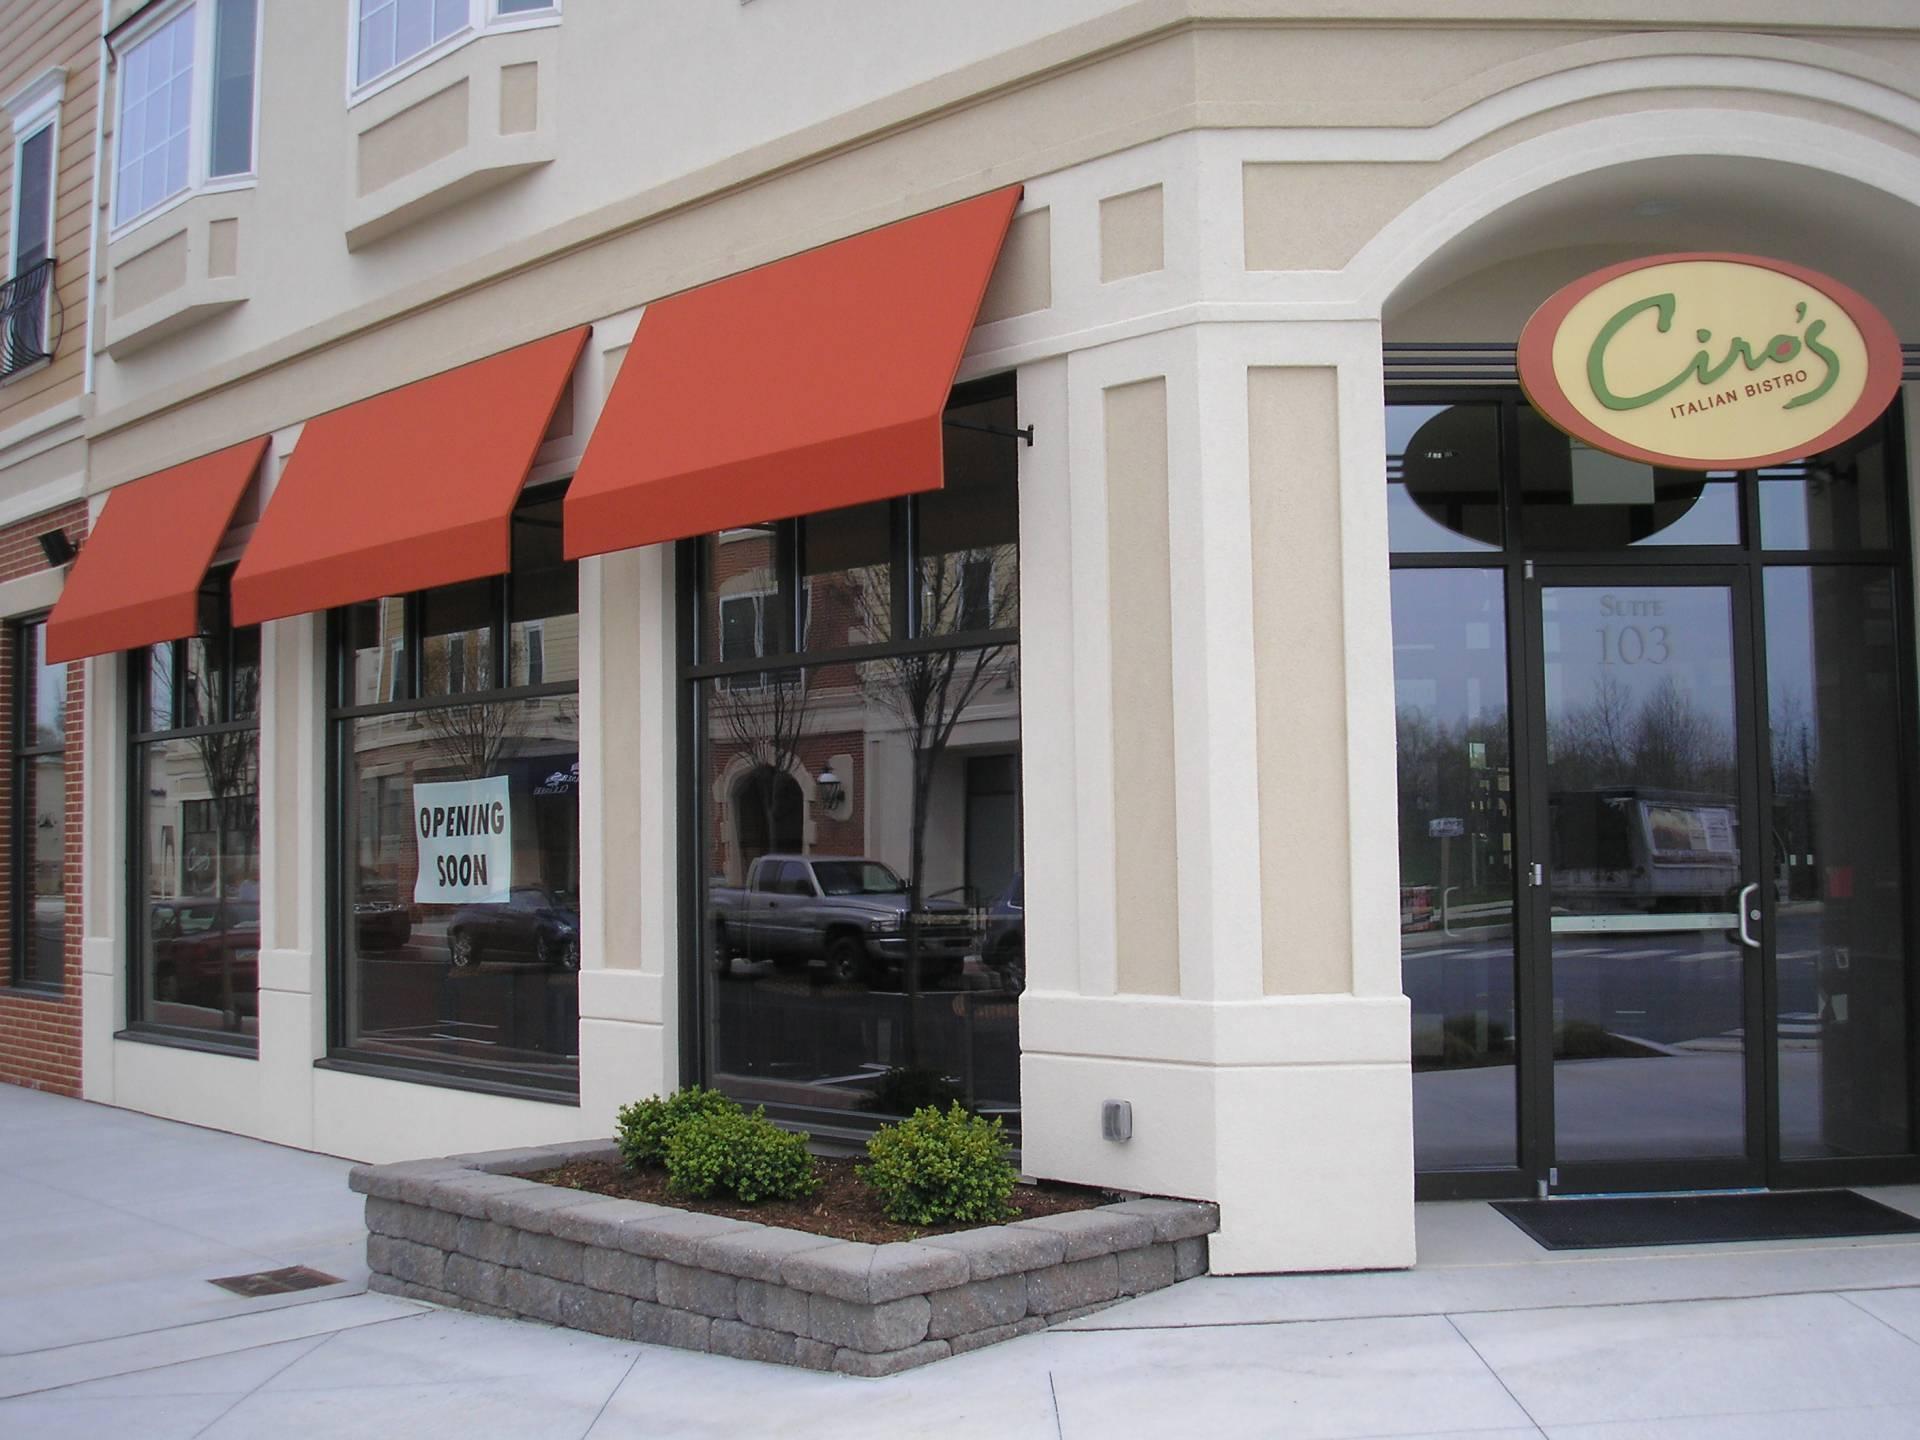 Ciro S Italian Bistro Restaurant Awnings Lancaster Pa